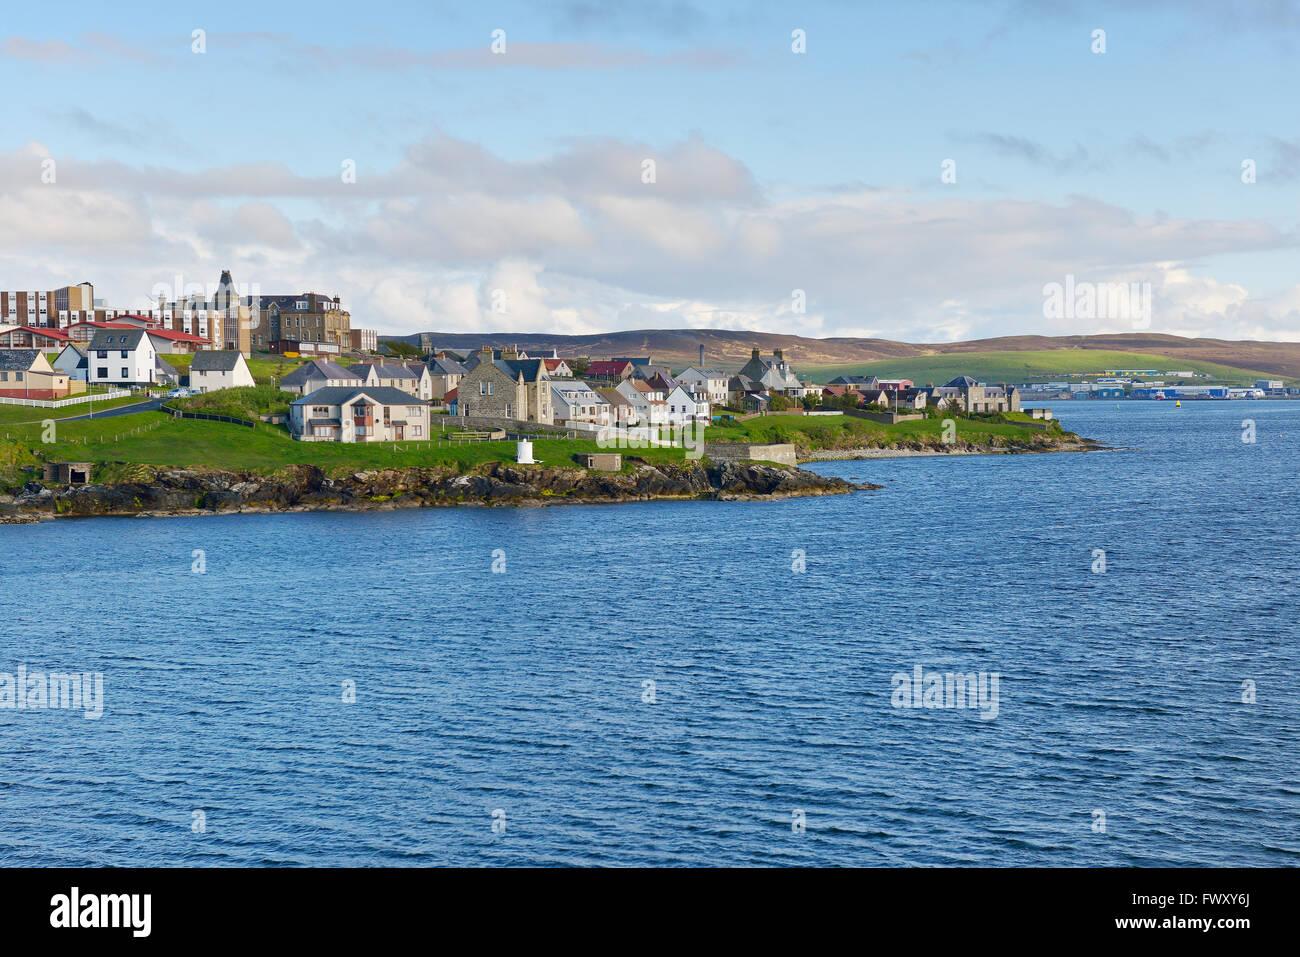 UK, Scotland, Shetland, Lerwick, Town along coastline - Stock Image